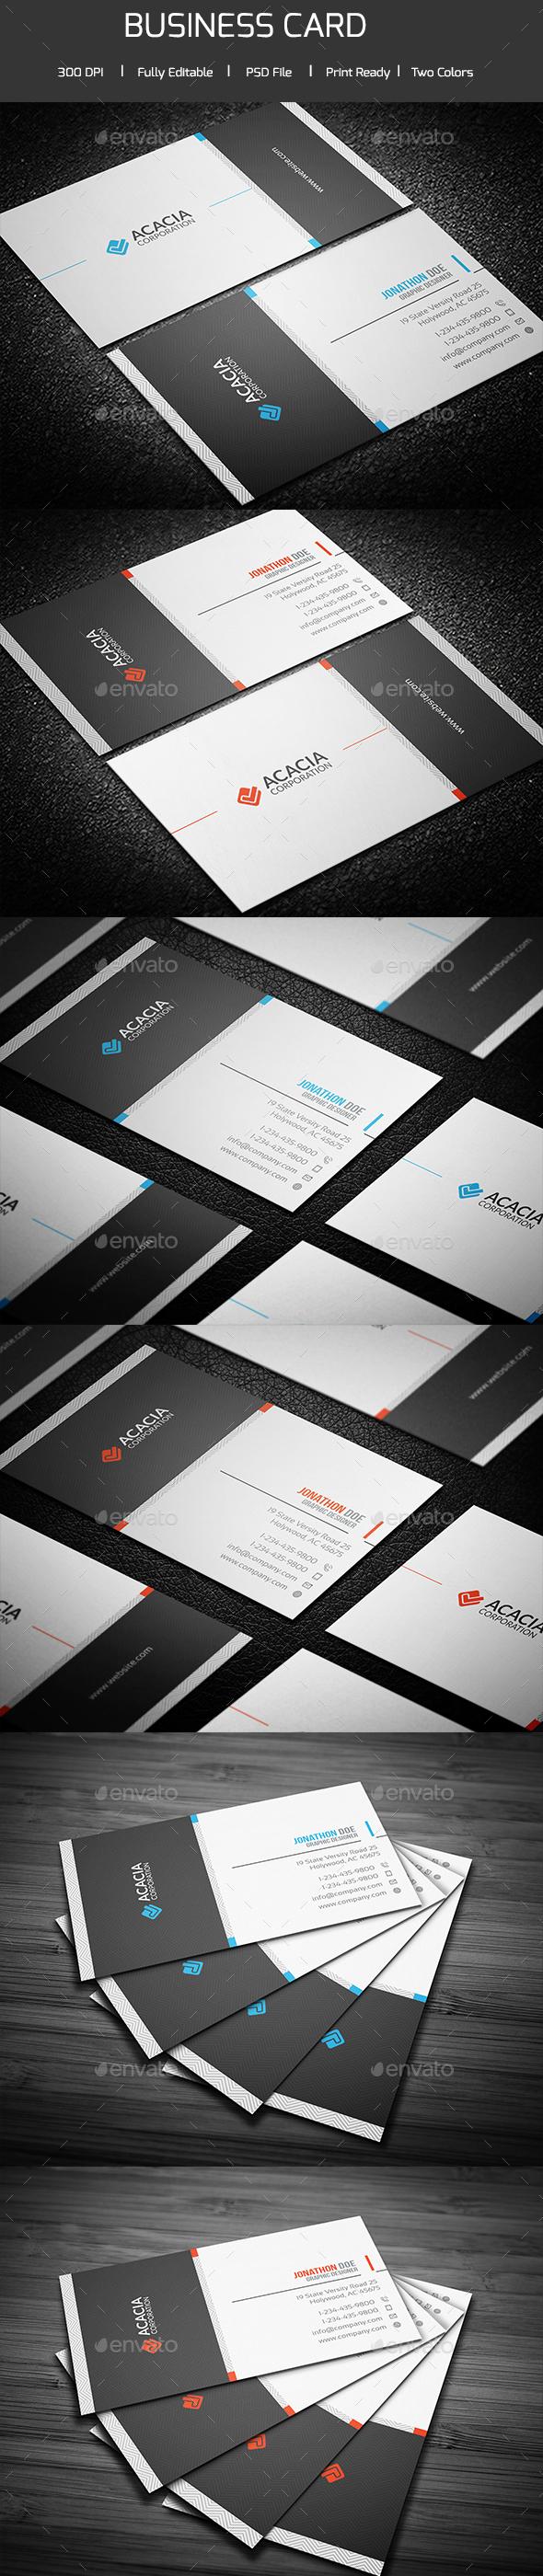 Mega Acacia Business Card - Corporate Business Cards